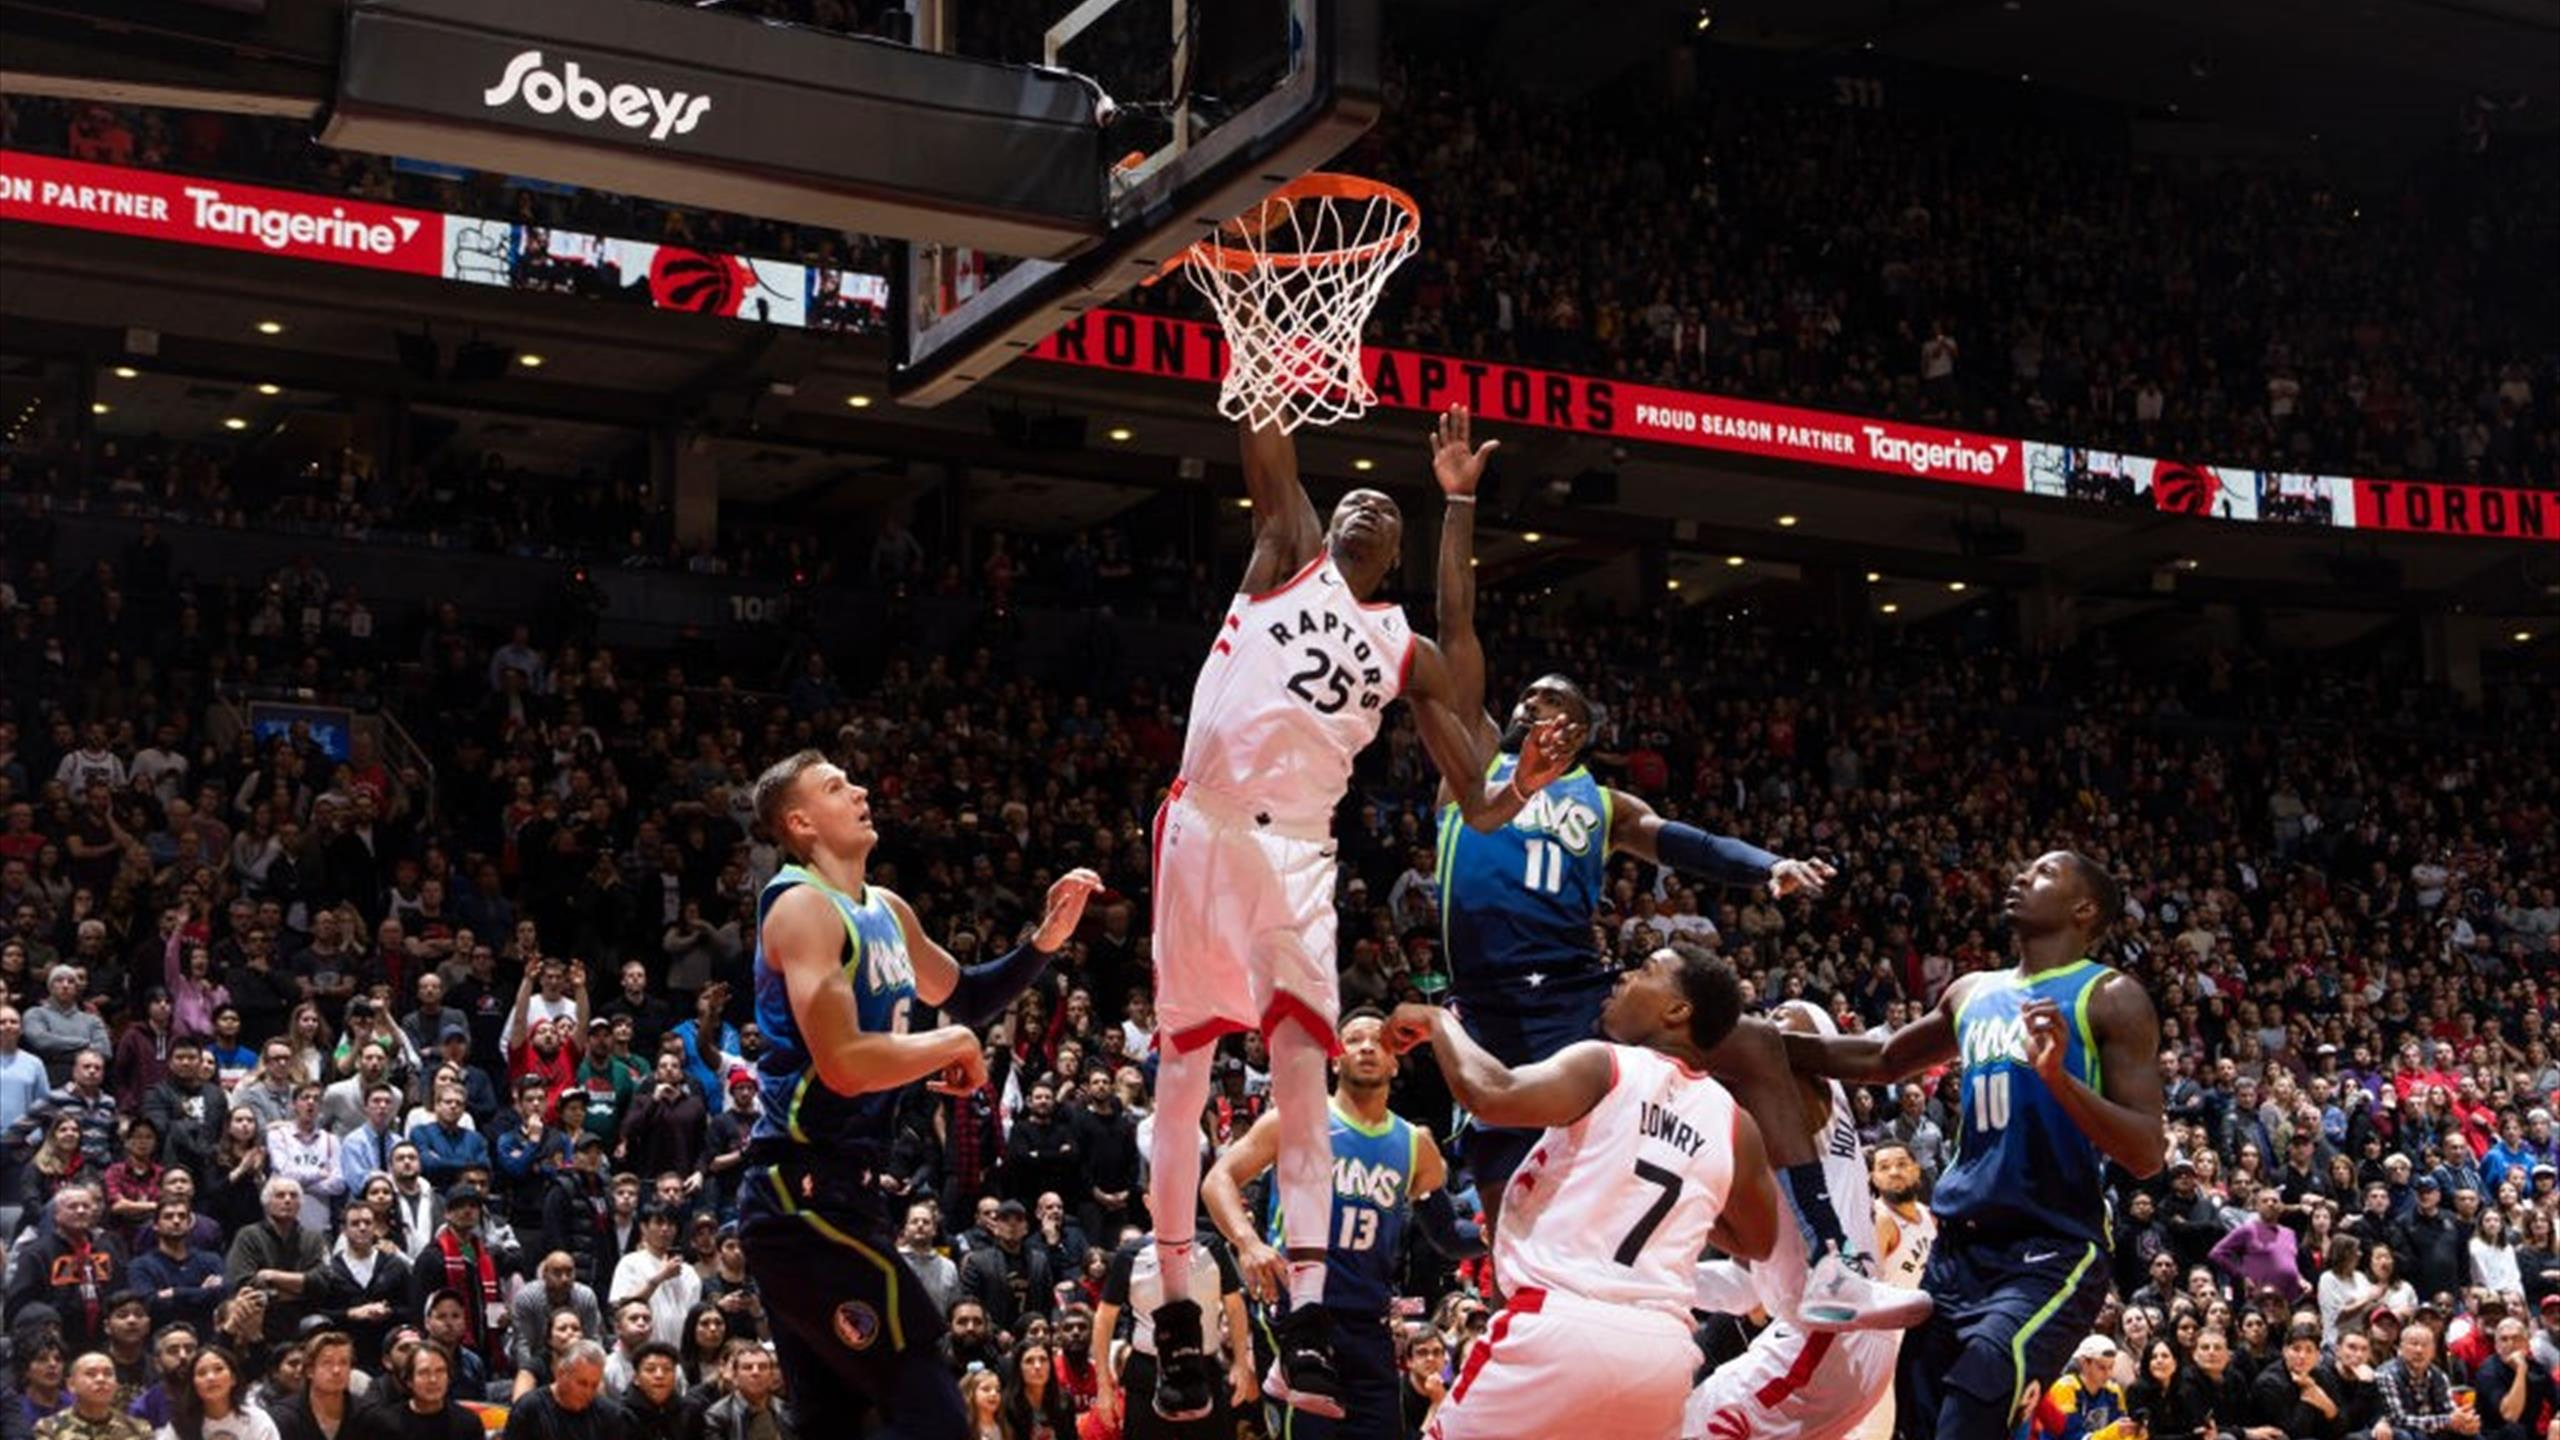 StubHub's 2019 NBA Preview: Los Angeles Teams Dominate as